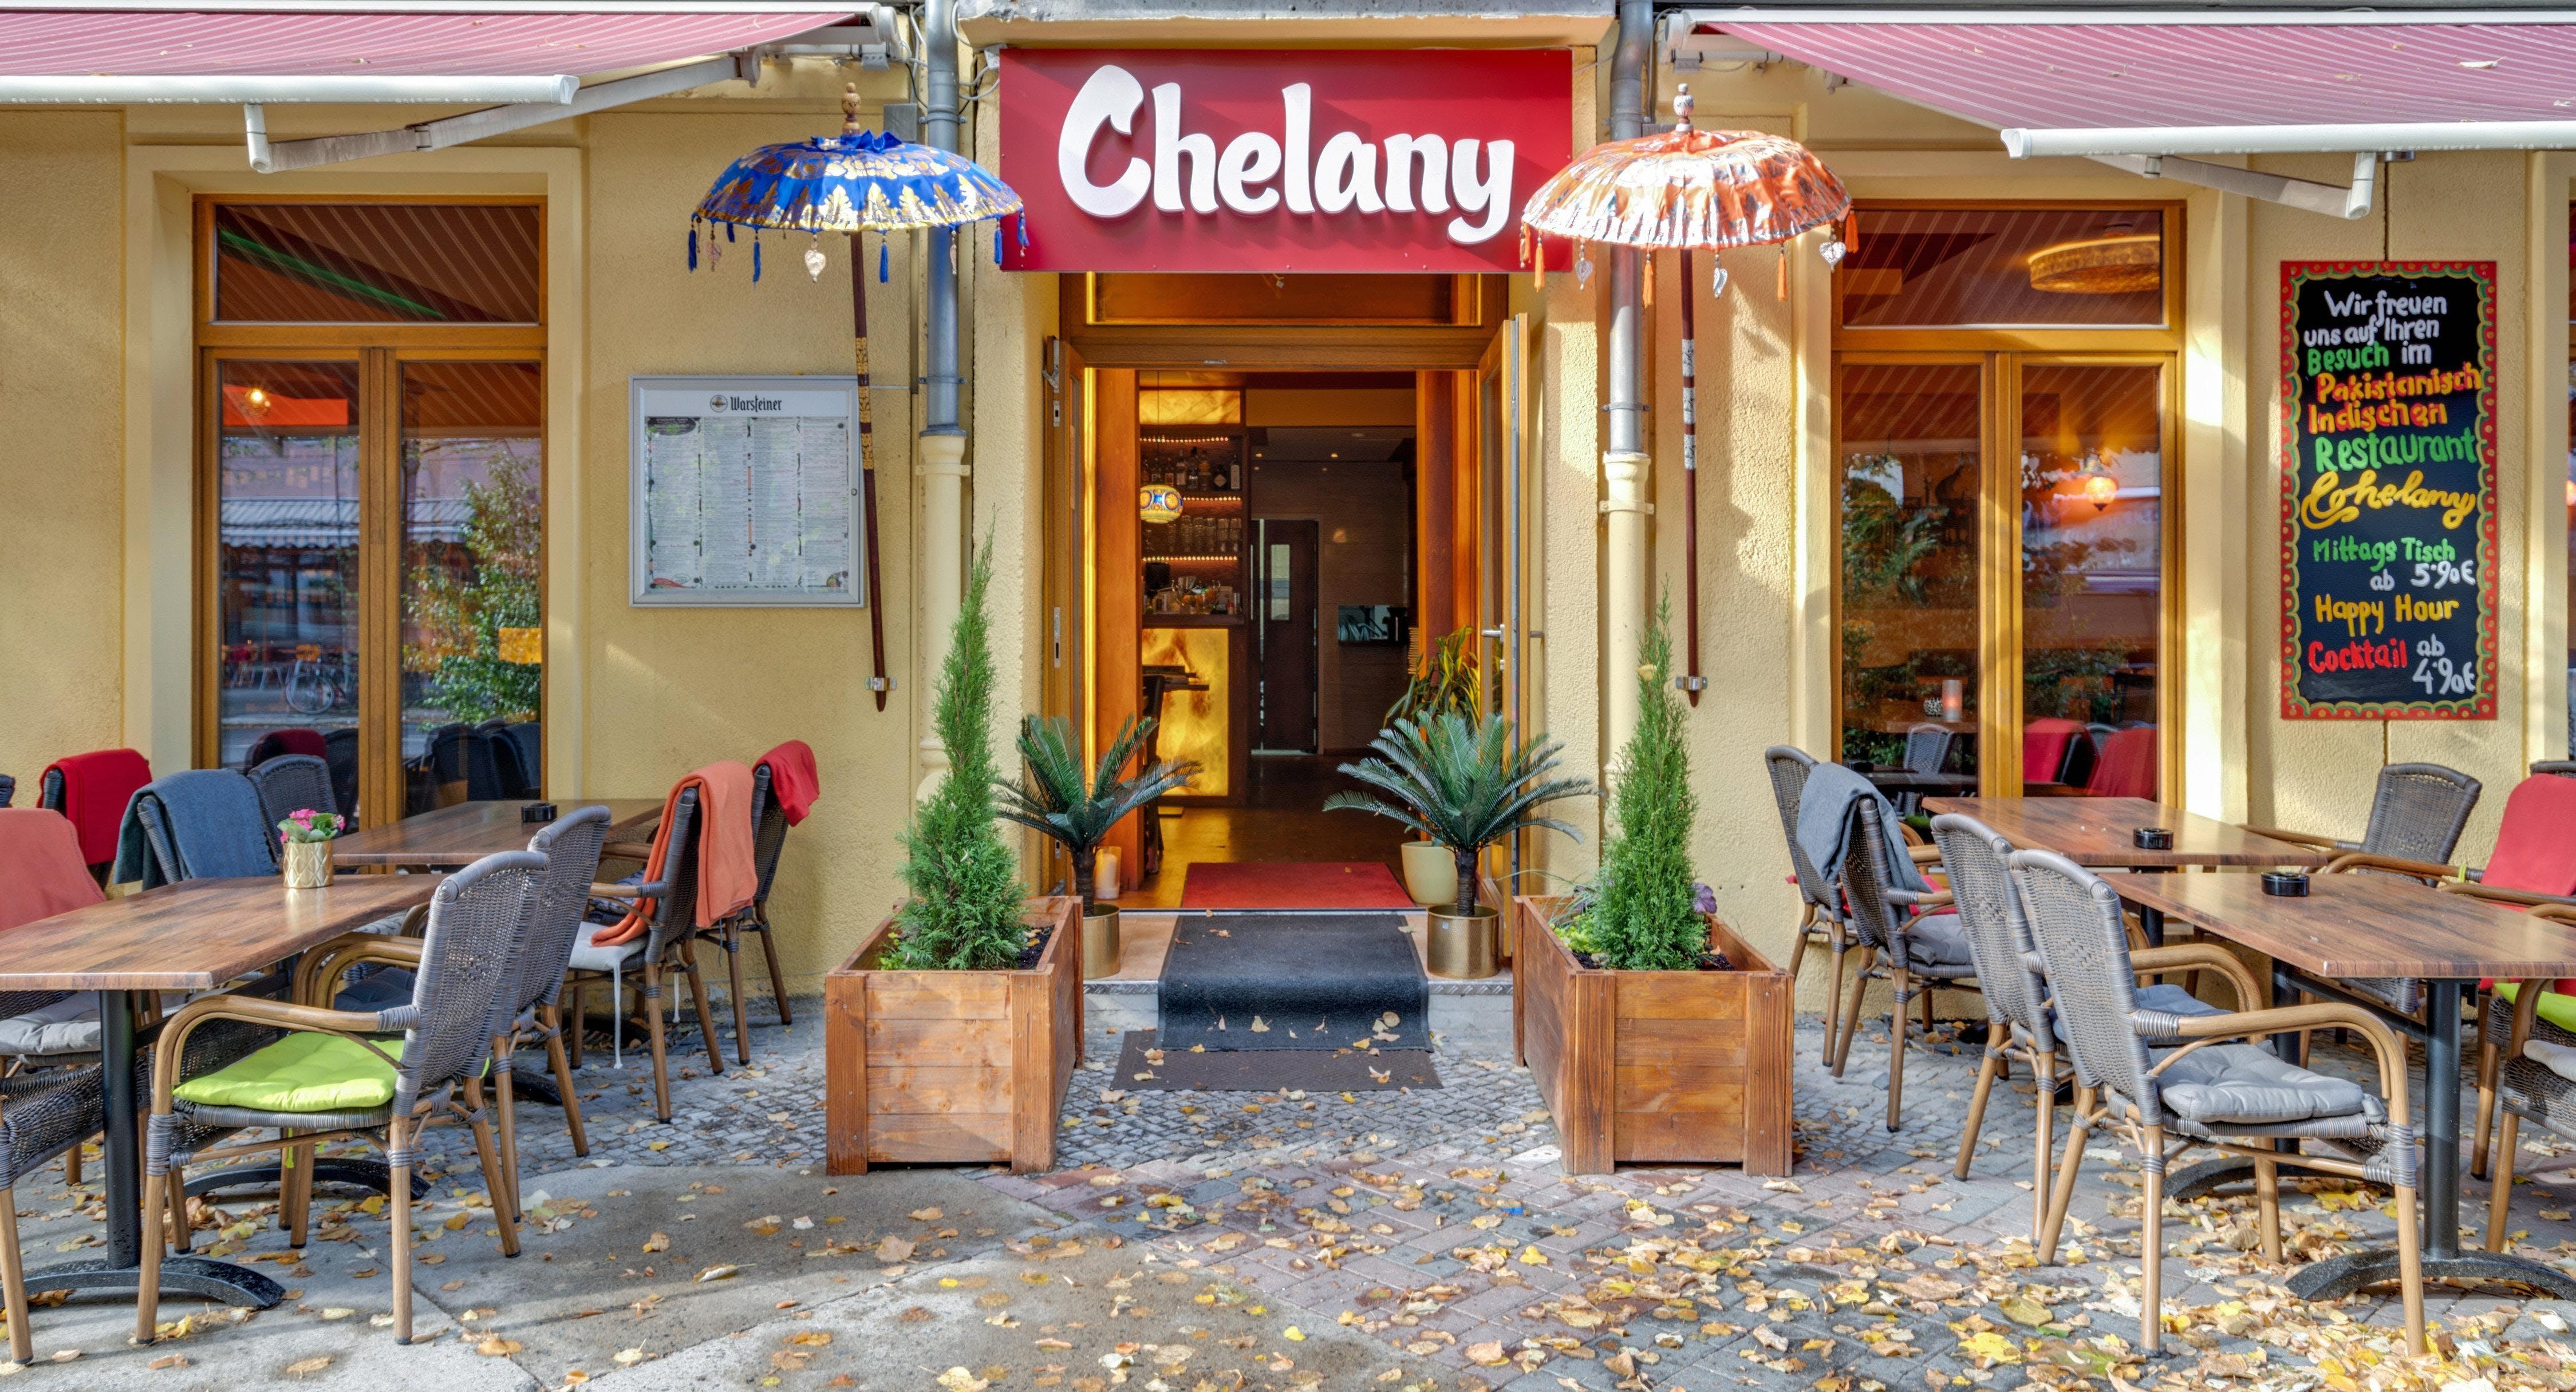 Chelany Mitte